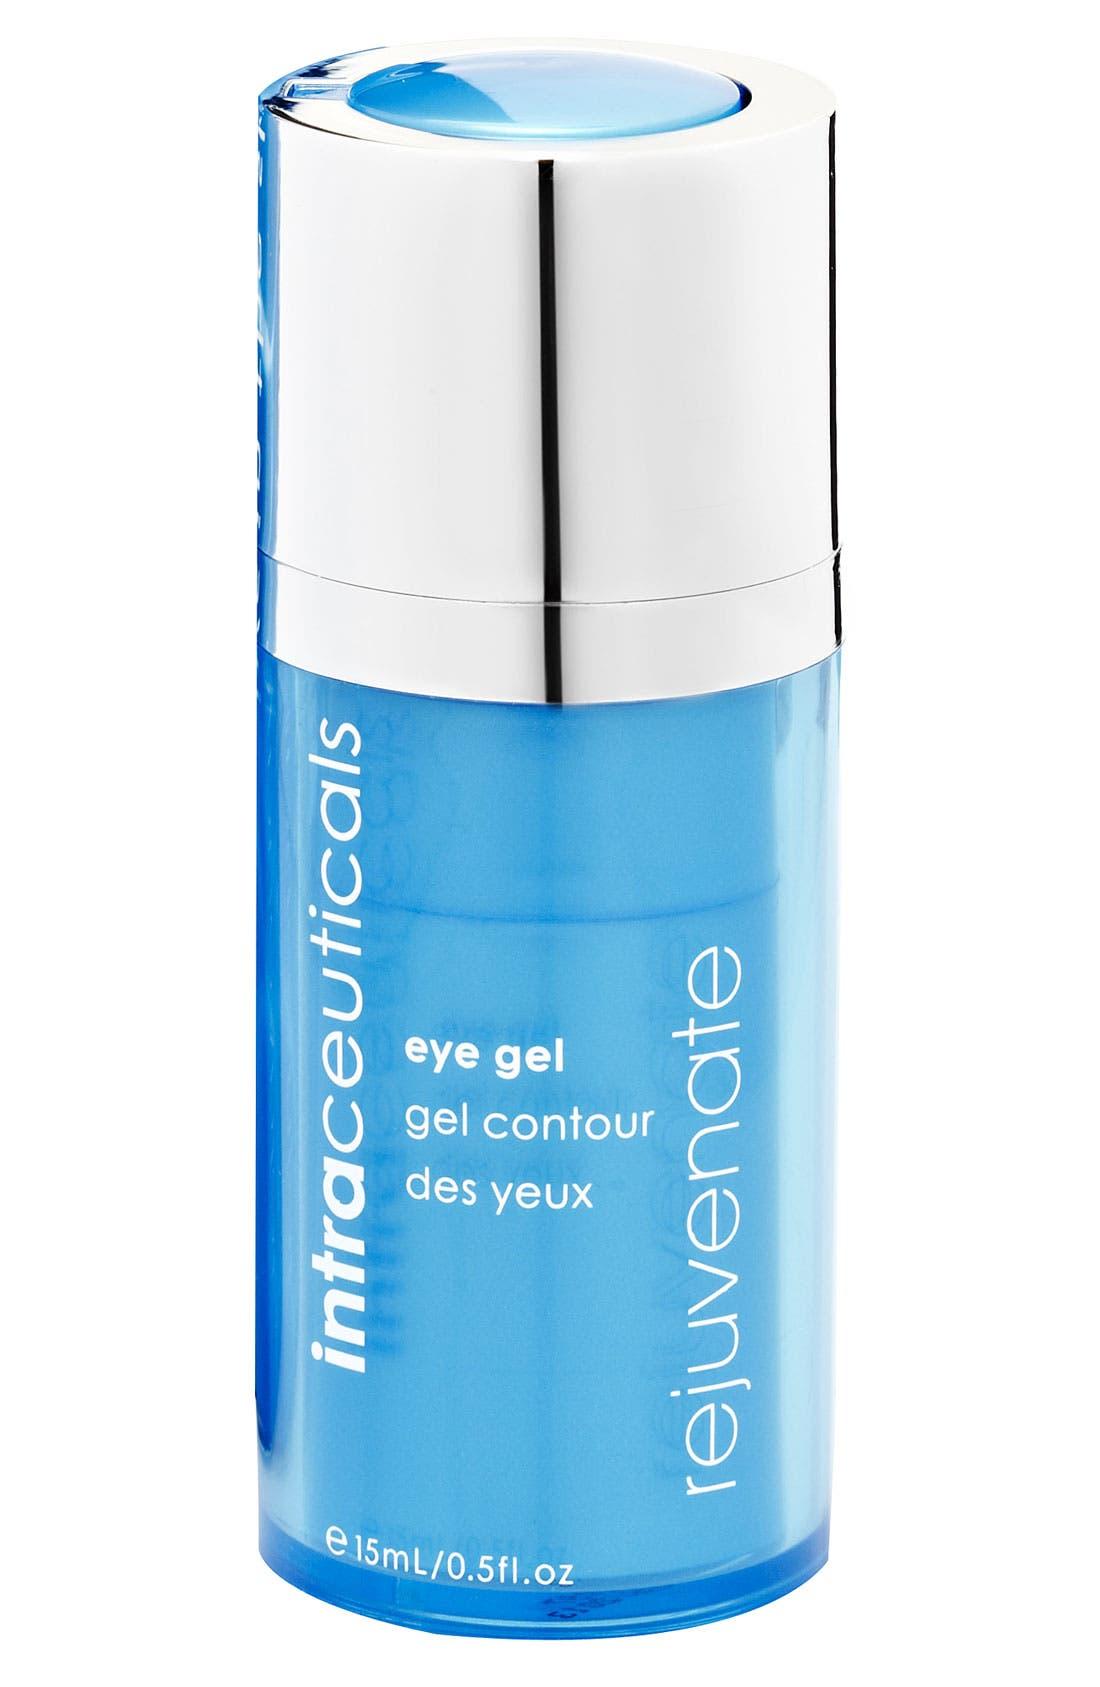 intraceuticals® 'Rejuvenate' Eye Contour Gel